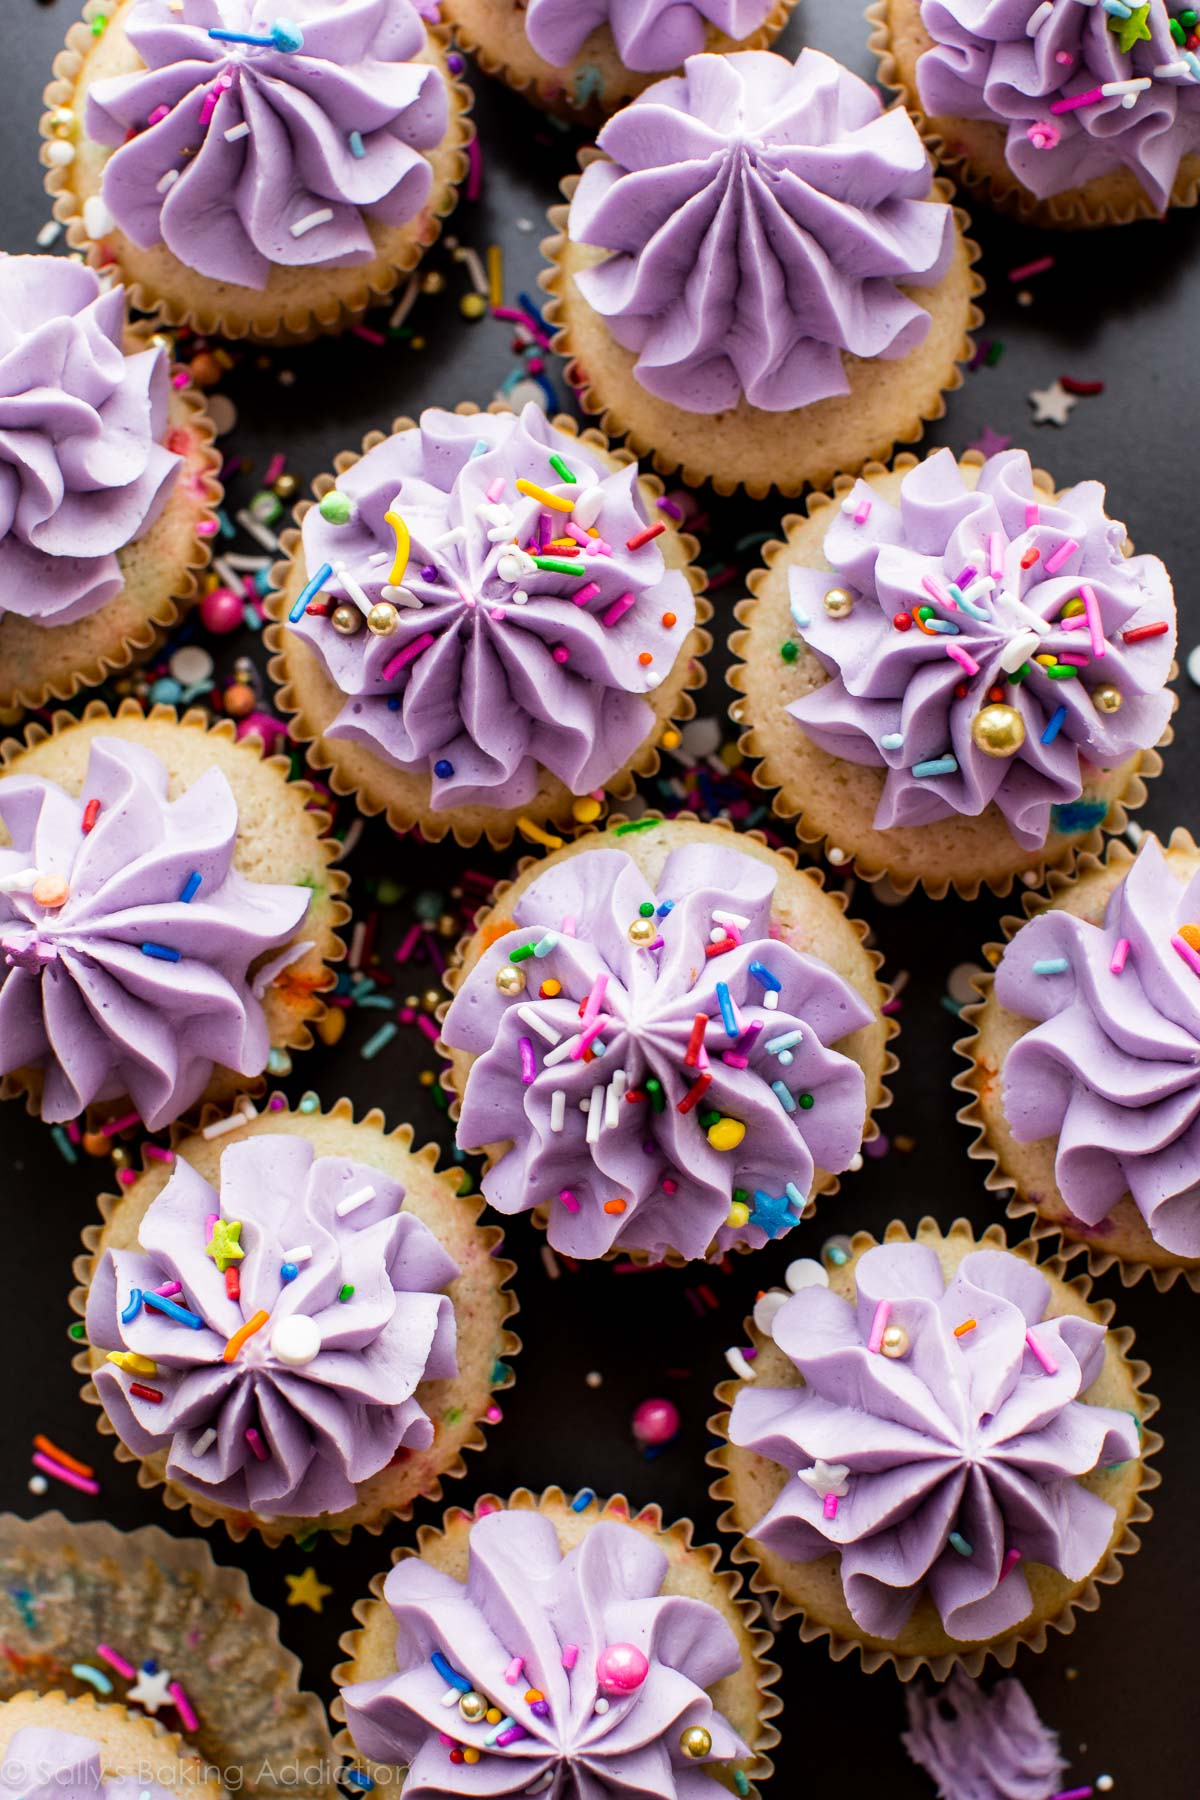 image aérienne de cupcakes funfetti avec glaçage violet et arrose